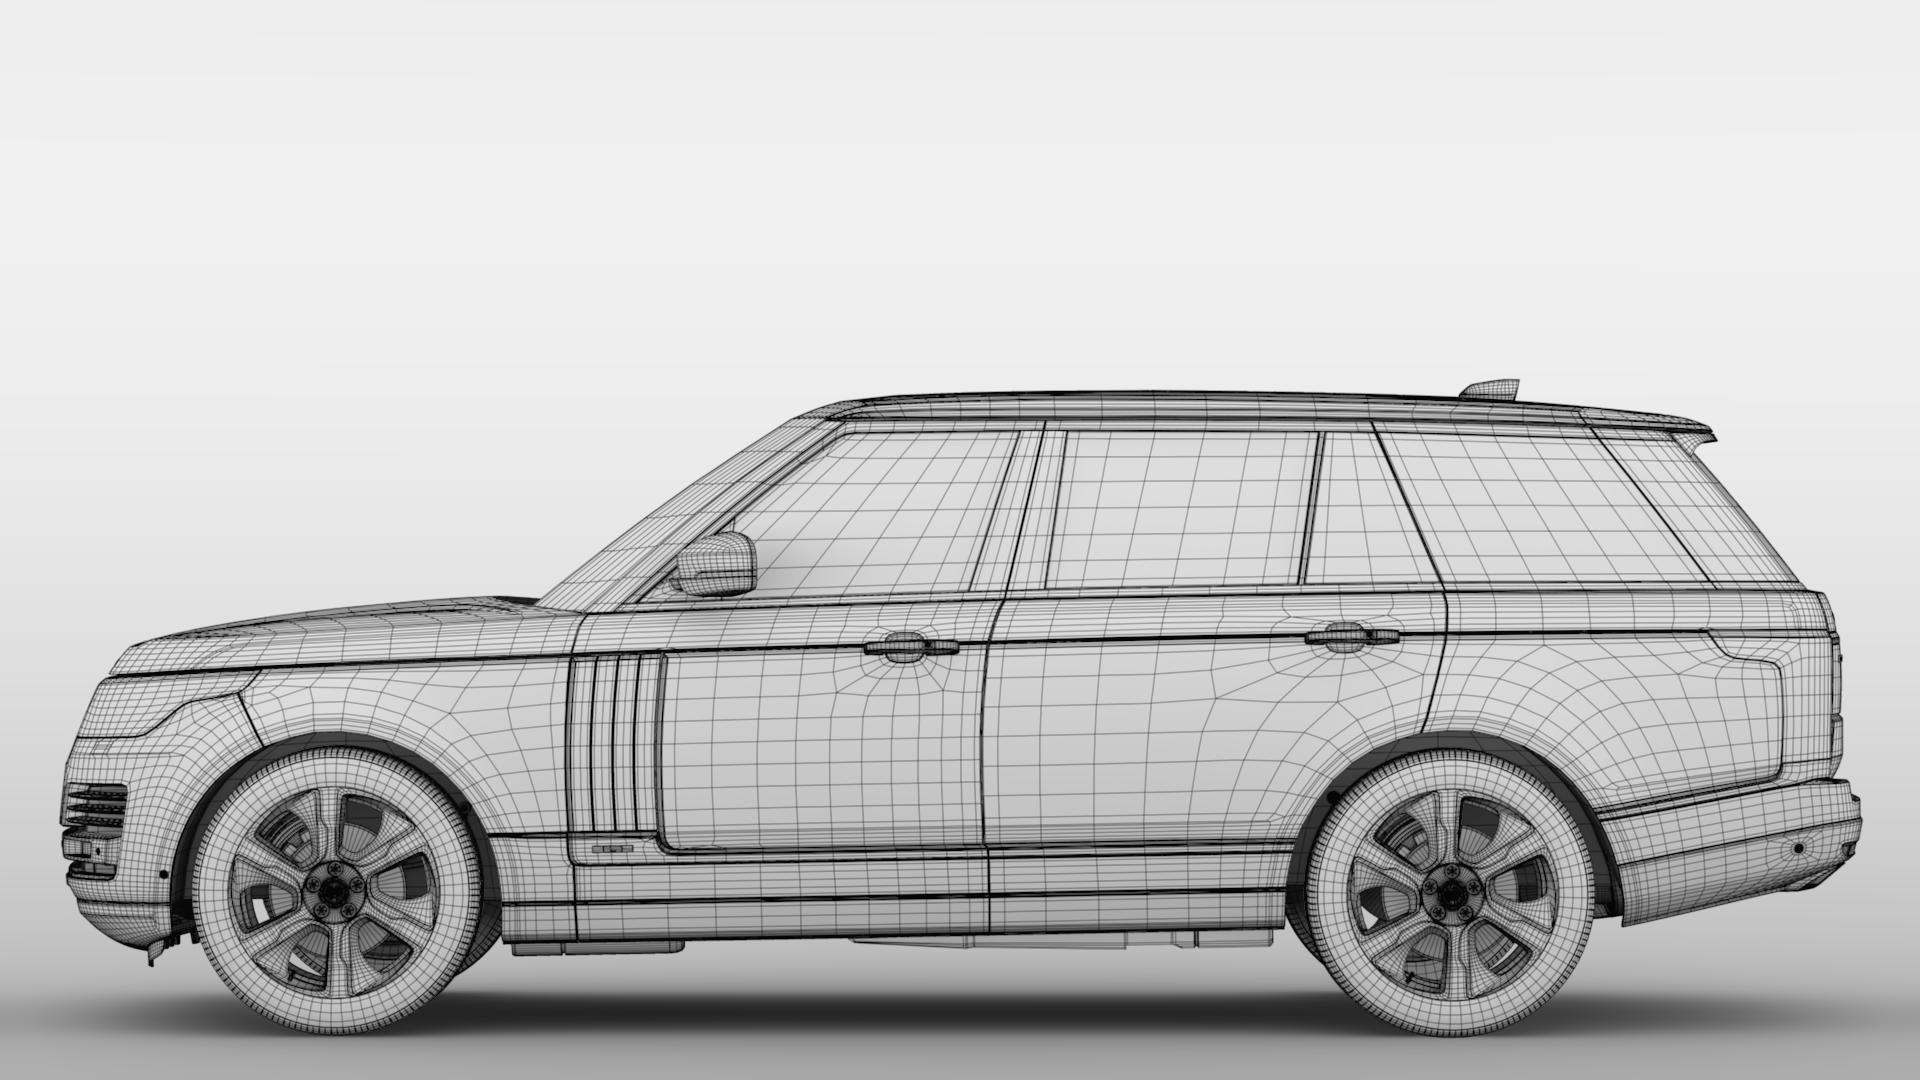 range rover hybrid lwb l405 2018 3d model max fbx c4d lwo ma mb hrc xsi obj 277433